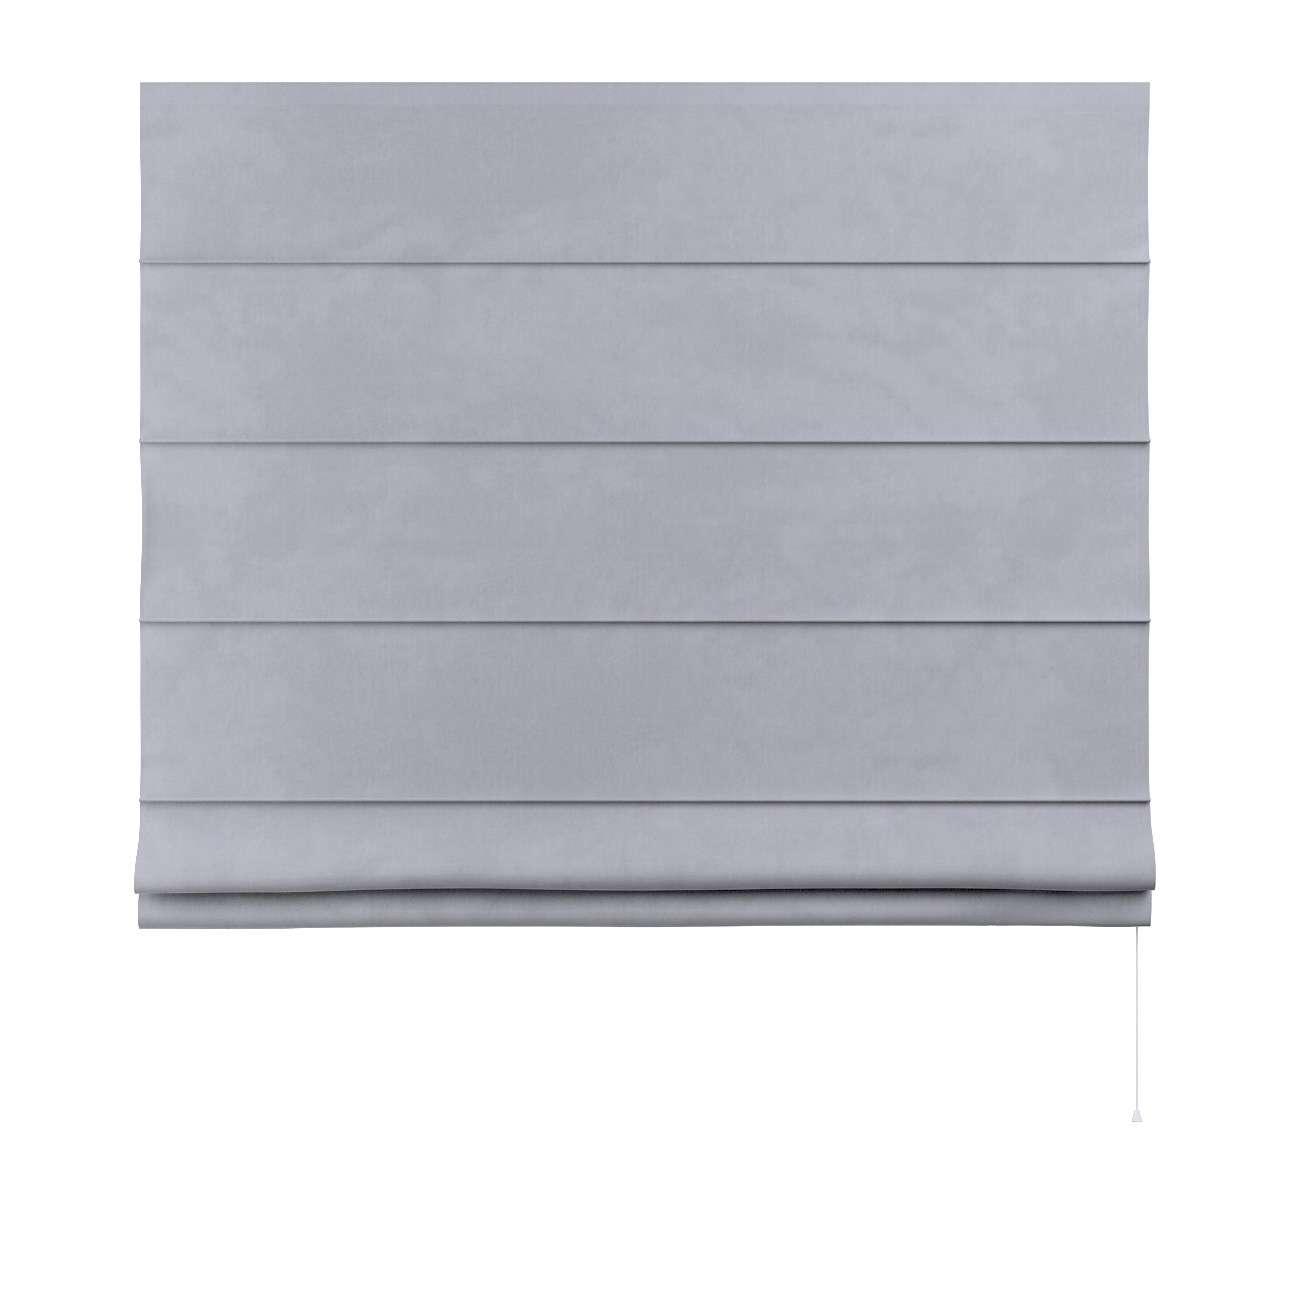 Rímska roleta Capri V kolekcii Velvet, tkanina: 704-24